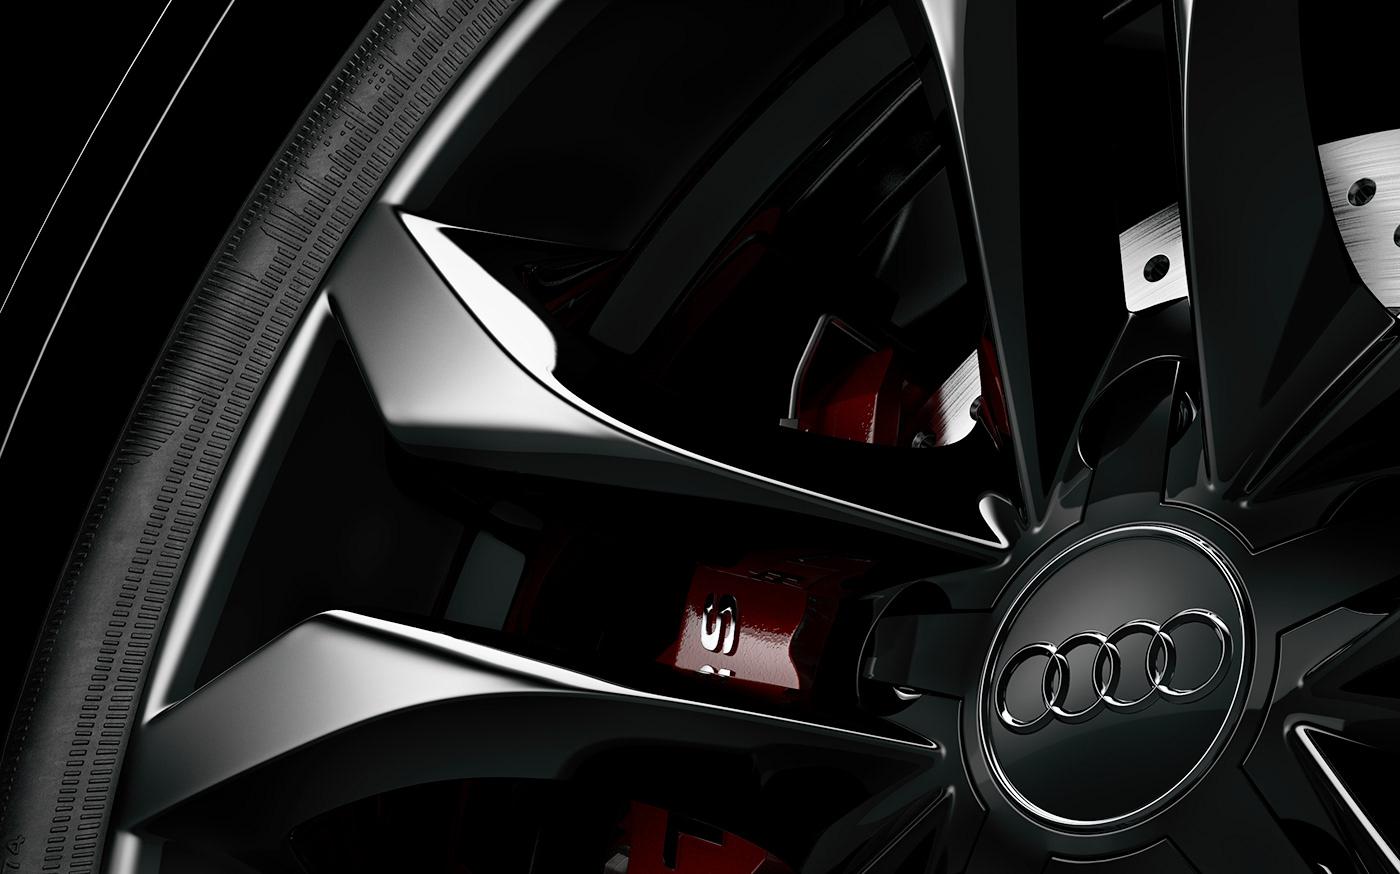 3D CGI vray Visualising Audi audi tt Autmotive car wheel tyre